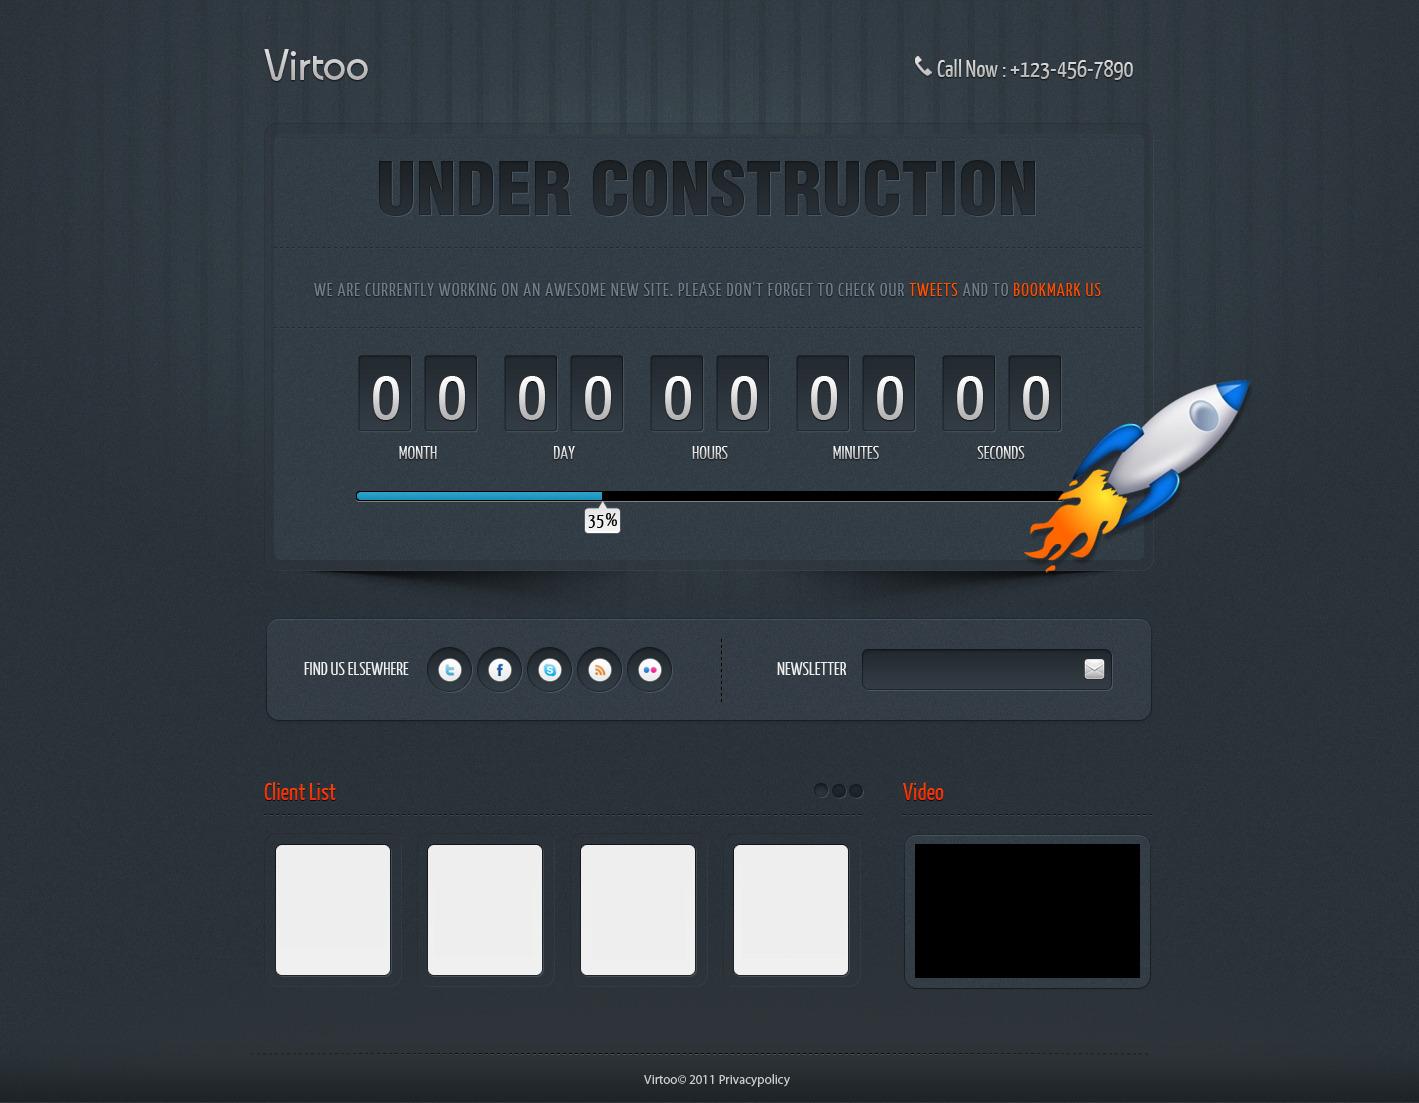 Virtoo – Under Construction Page